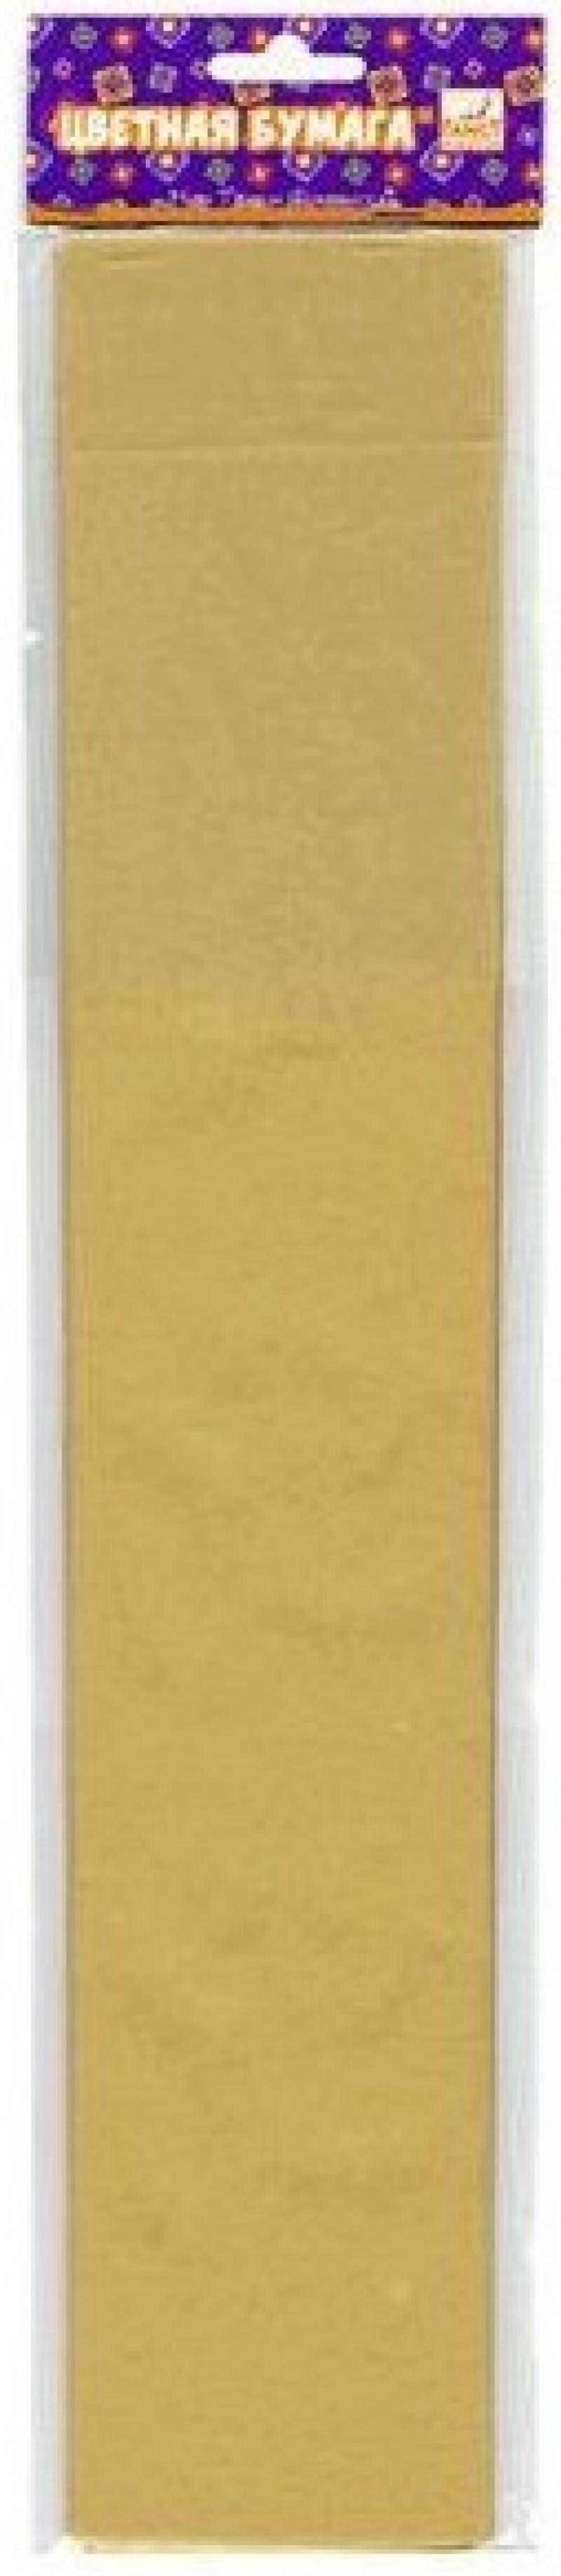 Цветная бумага Fancy Creative FD010029 250х50 см рулон крепированная